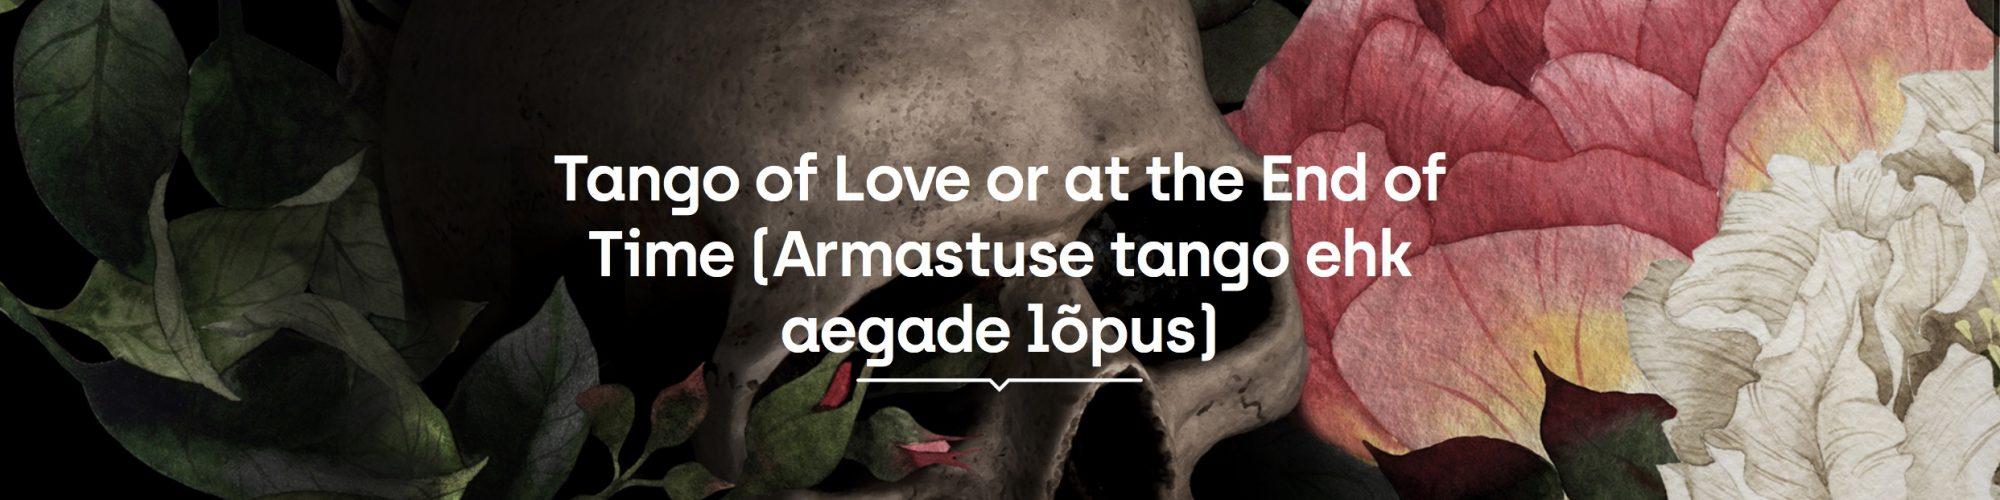 Armastuse Tango